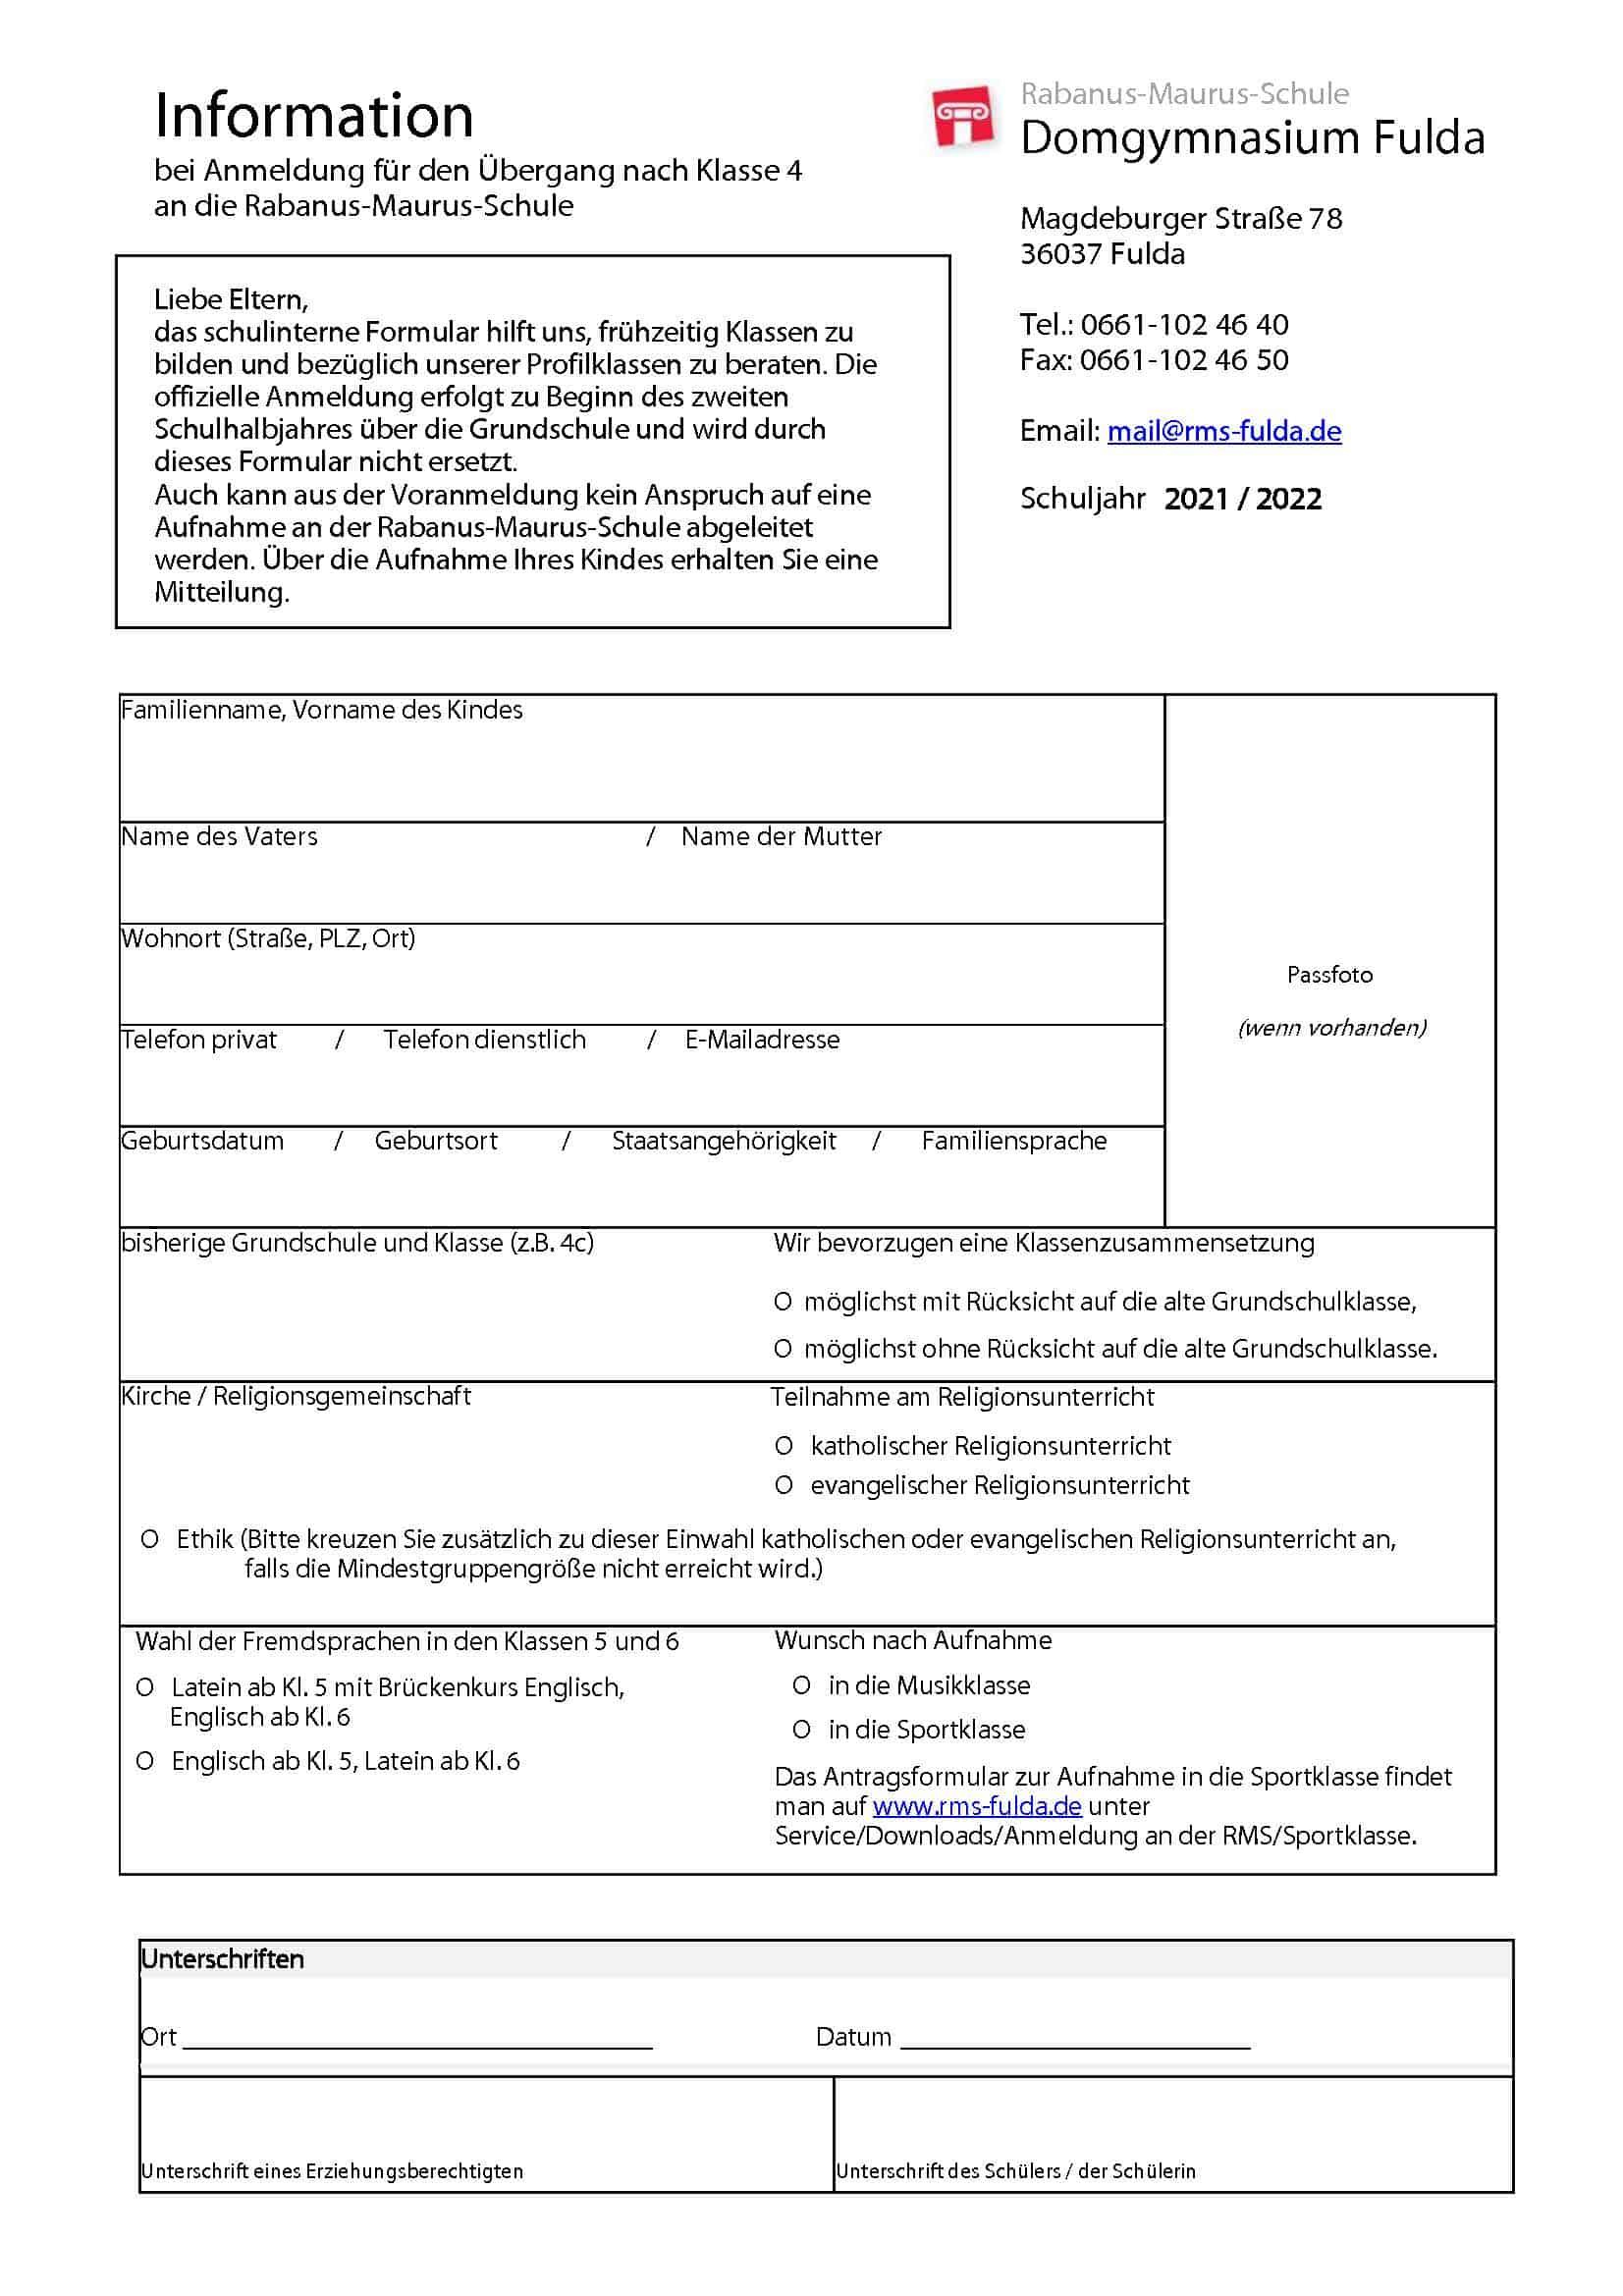 Anmeldeformular 5 2021 22 1